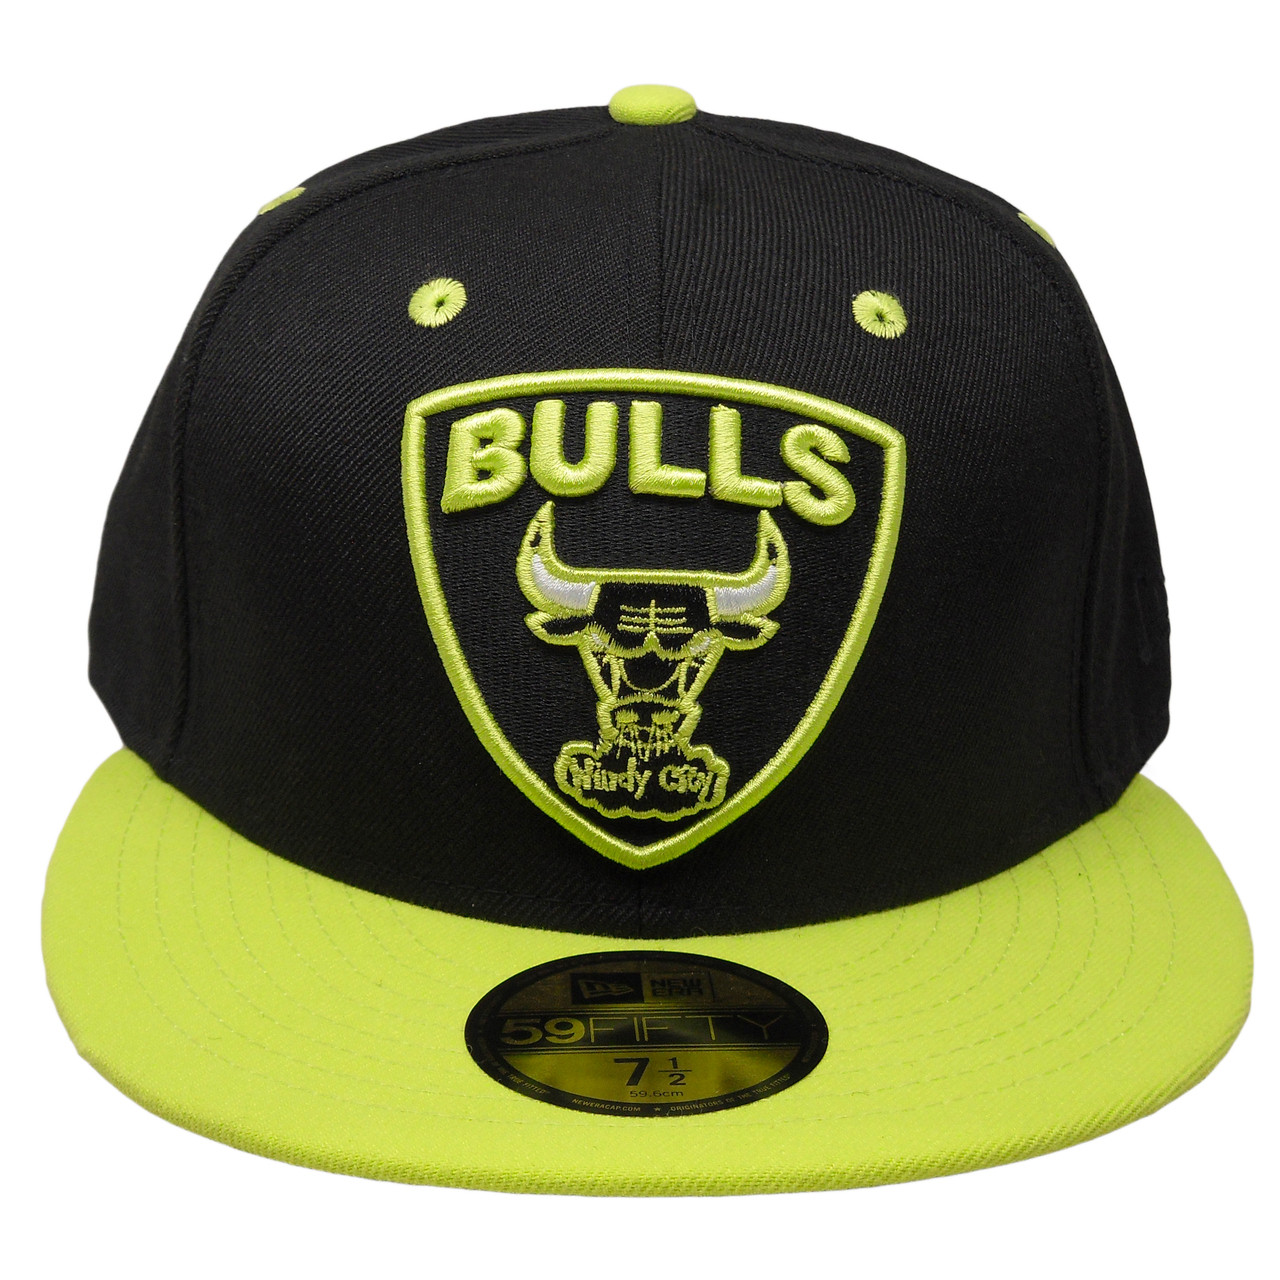 e1631c13a8d Chicago Bulls New Era Custom 59Fifty Fitted Hat - Black